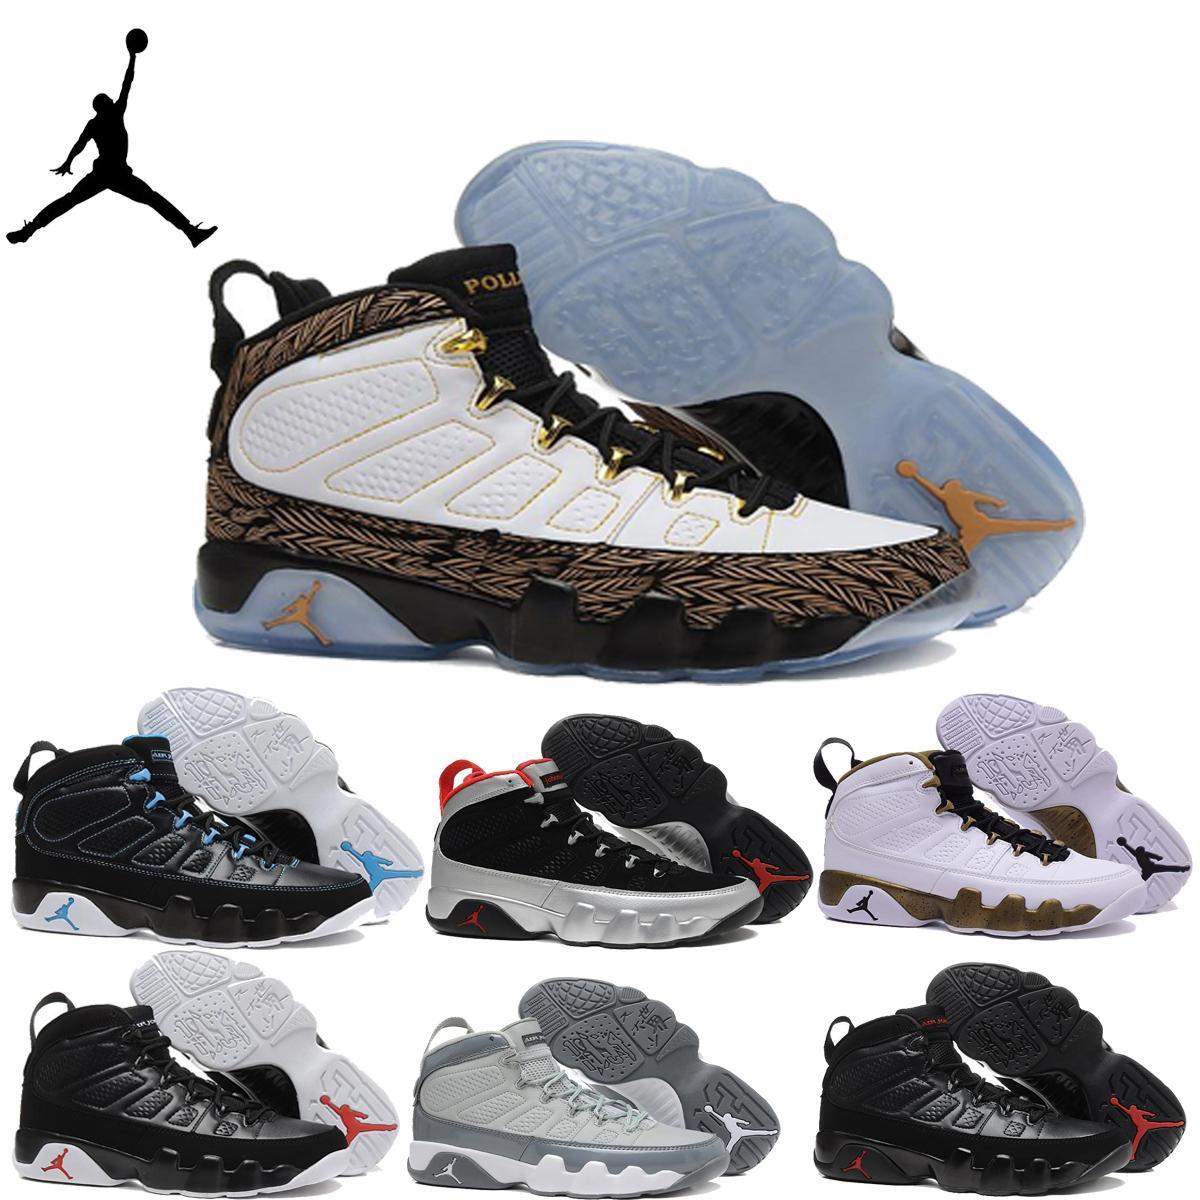 9940b250858 Nike Air Jordan 9 Retro Mens Basketball Shoes,Best Original Quality Nike  Jordans 9 Basketball Shoes Sneakers Basketball Shoes Men Sports Shoes  Online From ...